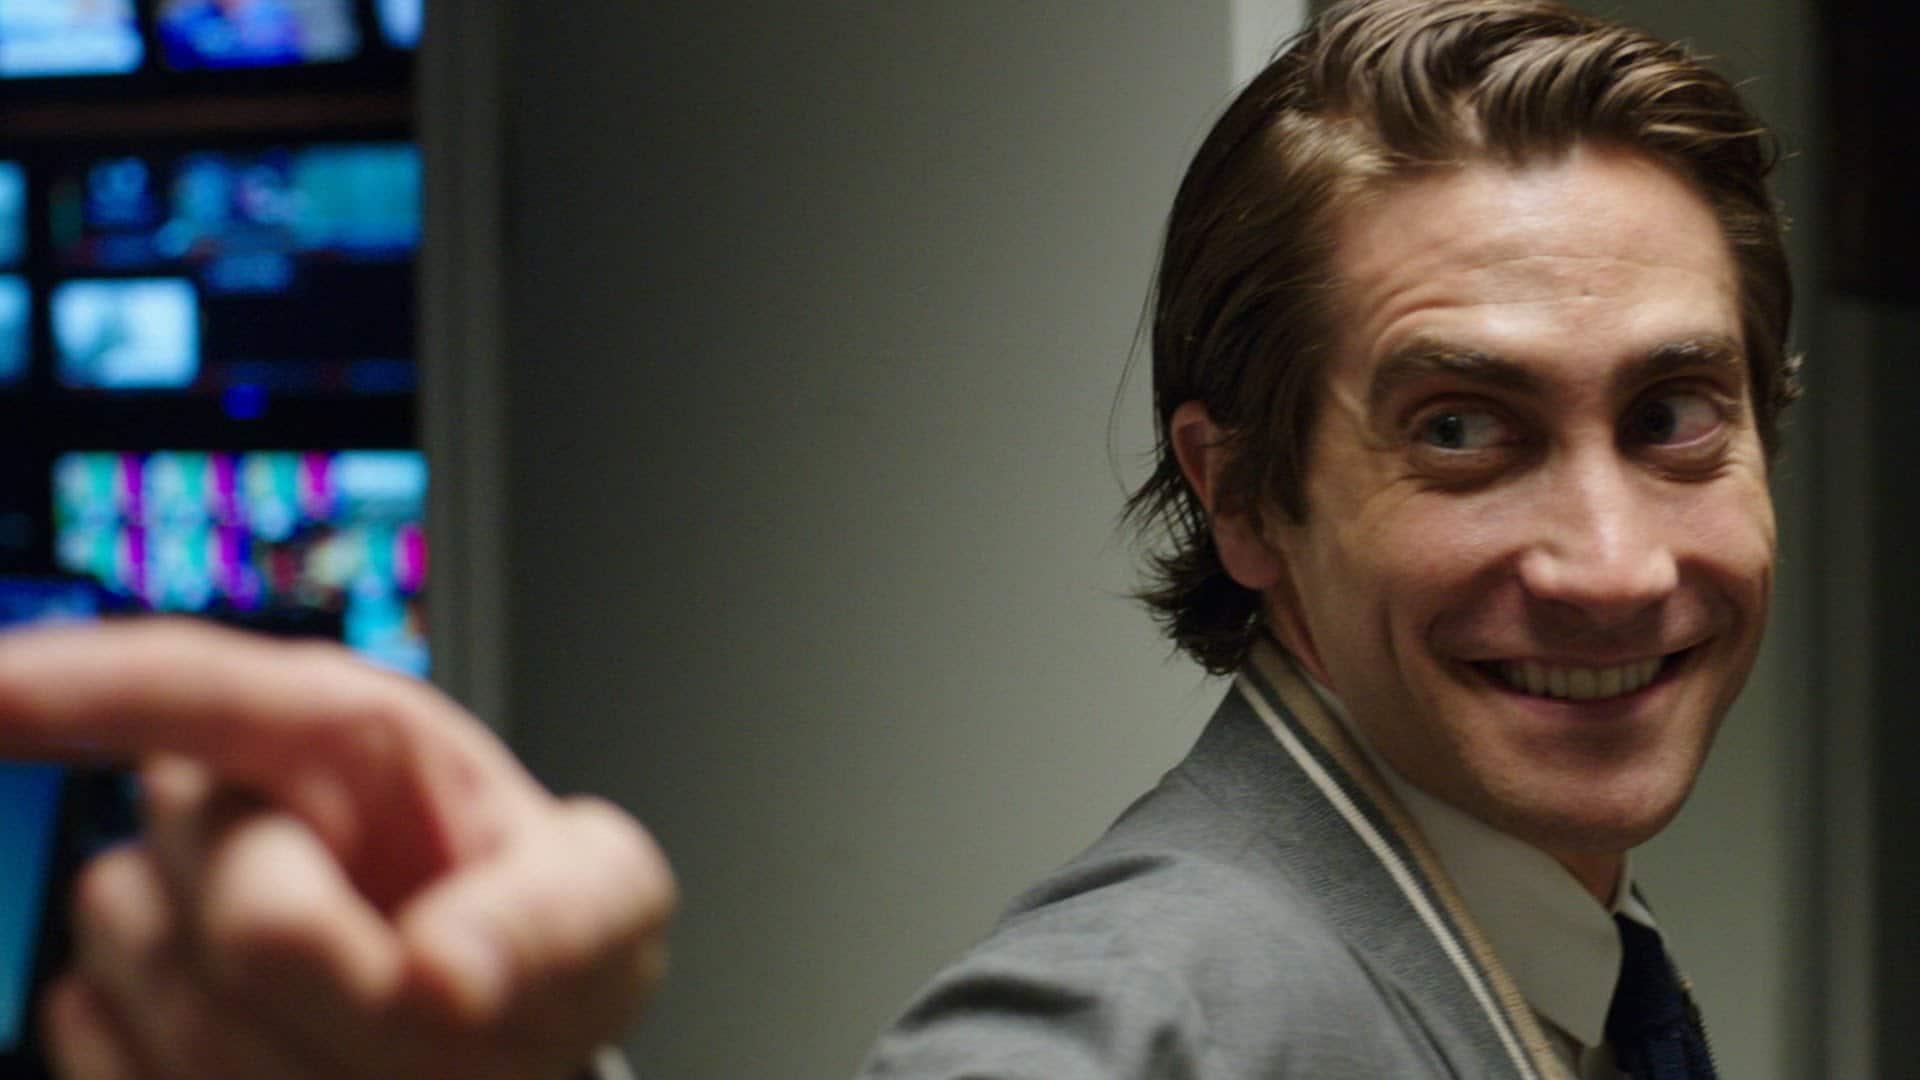 Lou Bloom (Jake Gyllenhaal) in Nightcrawler